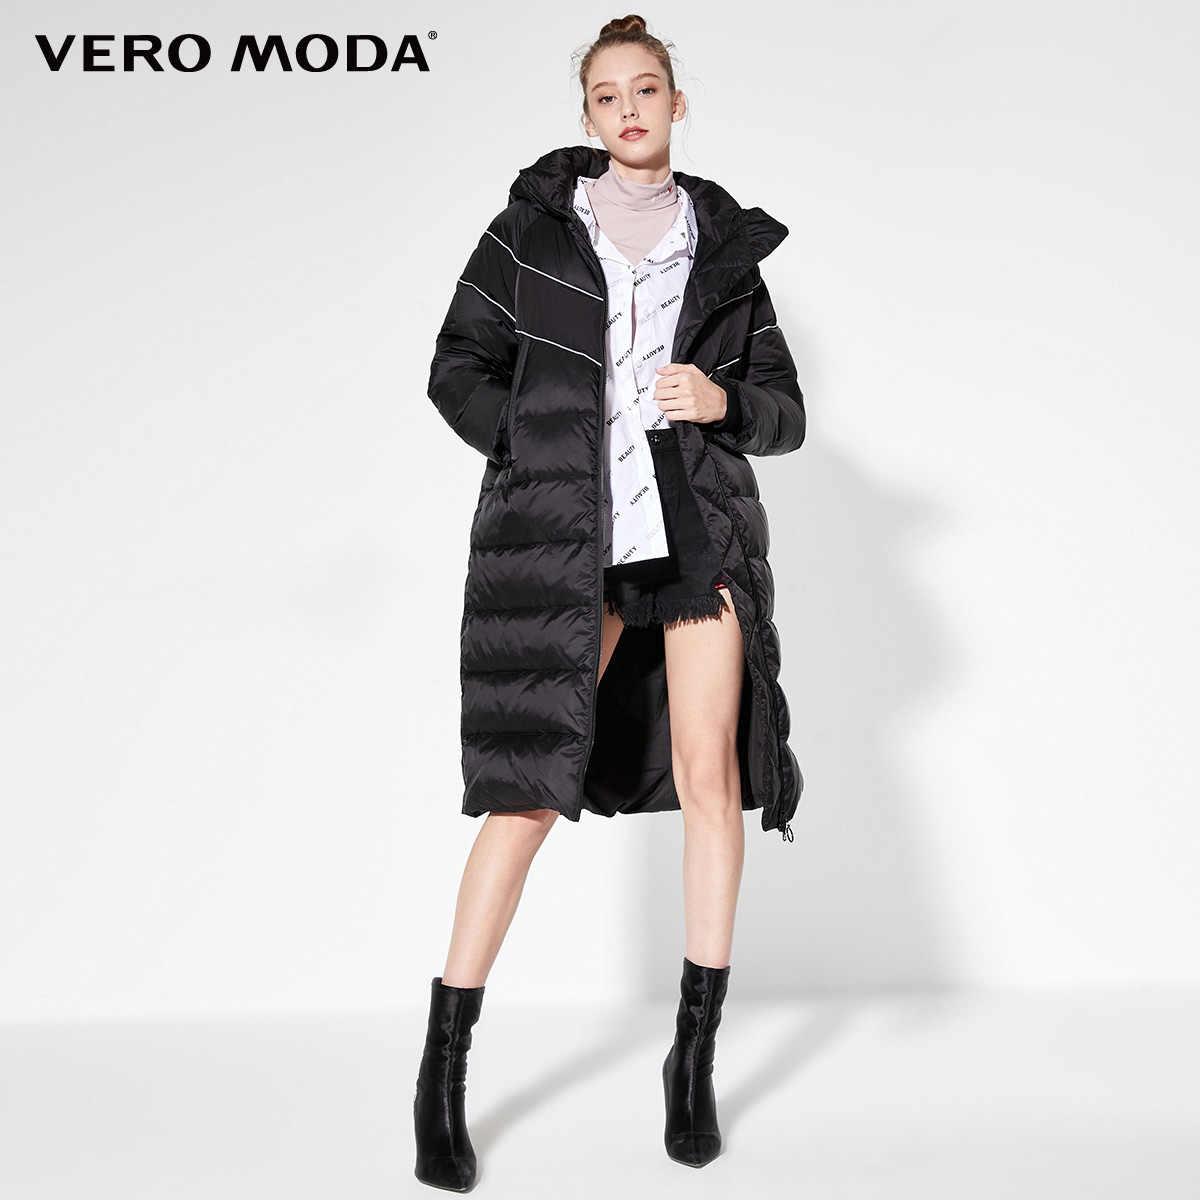 Vero Moda New Arrivals 3M Reflecterende Stof Contrast Down Parka Jas   319412511